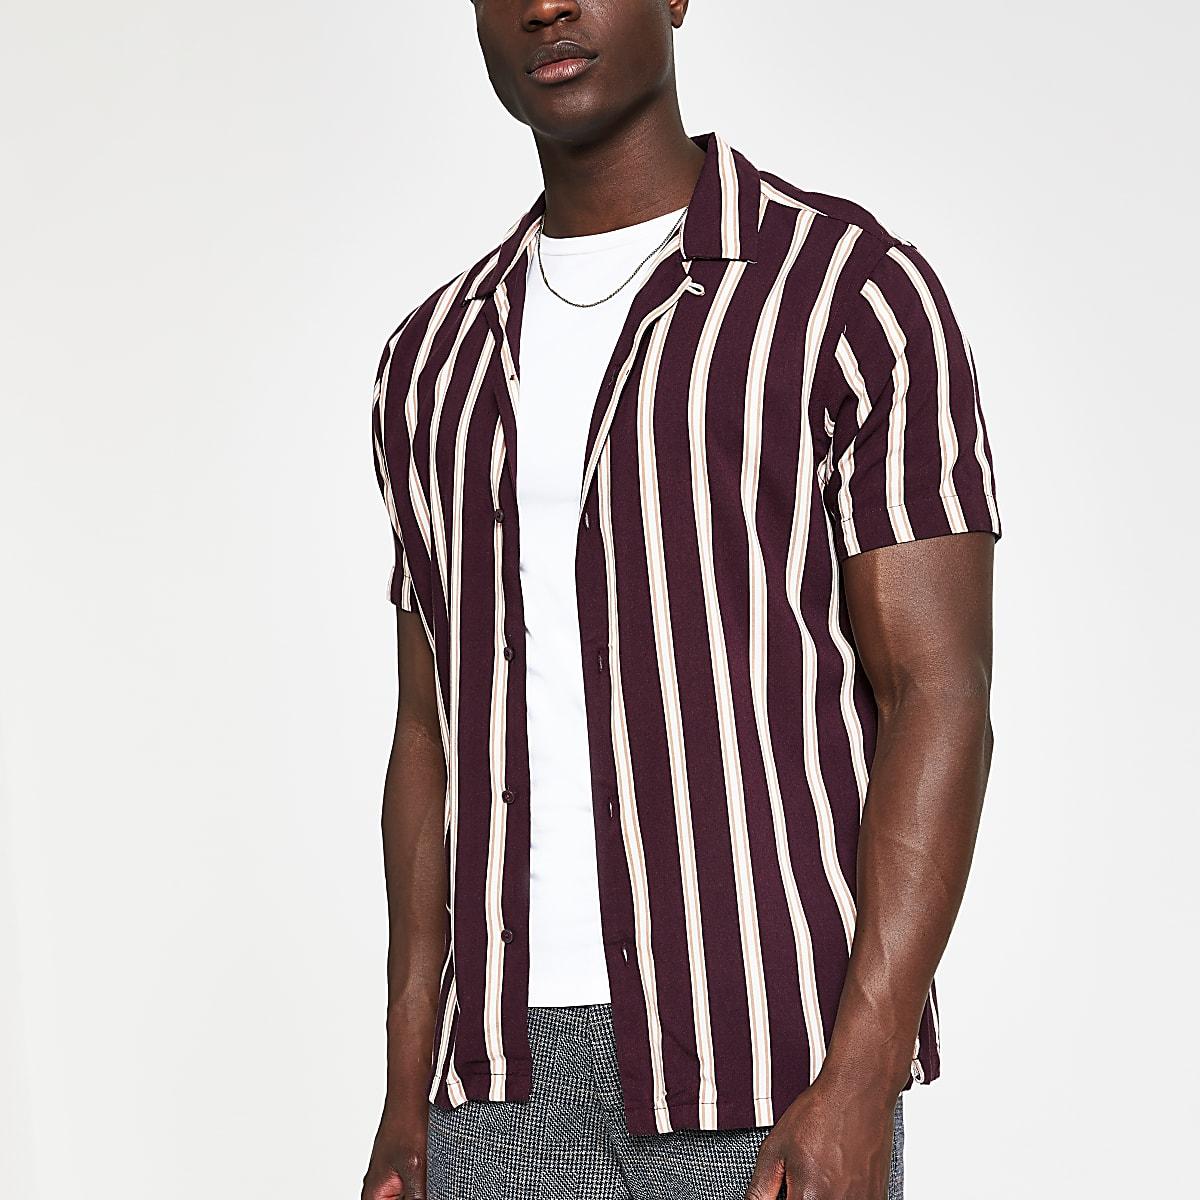 Jack and Jones brown stripe slim fit shirt